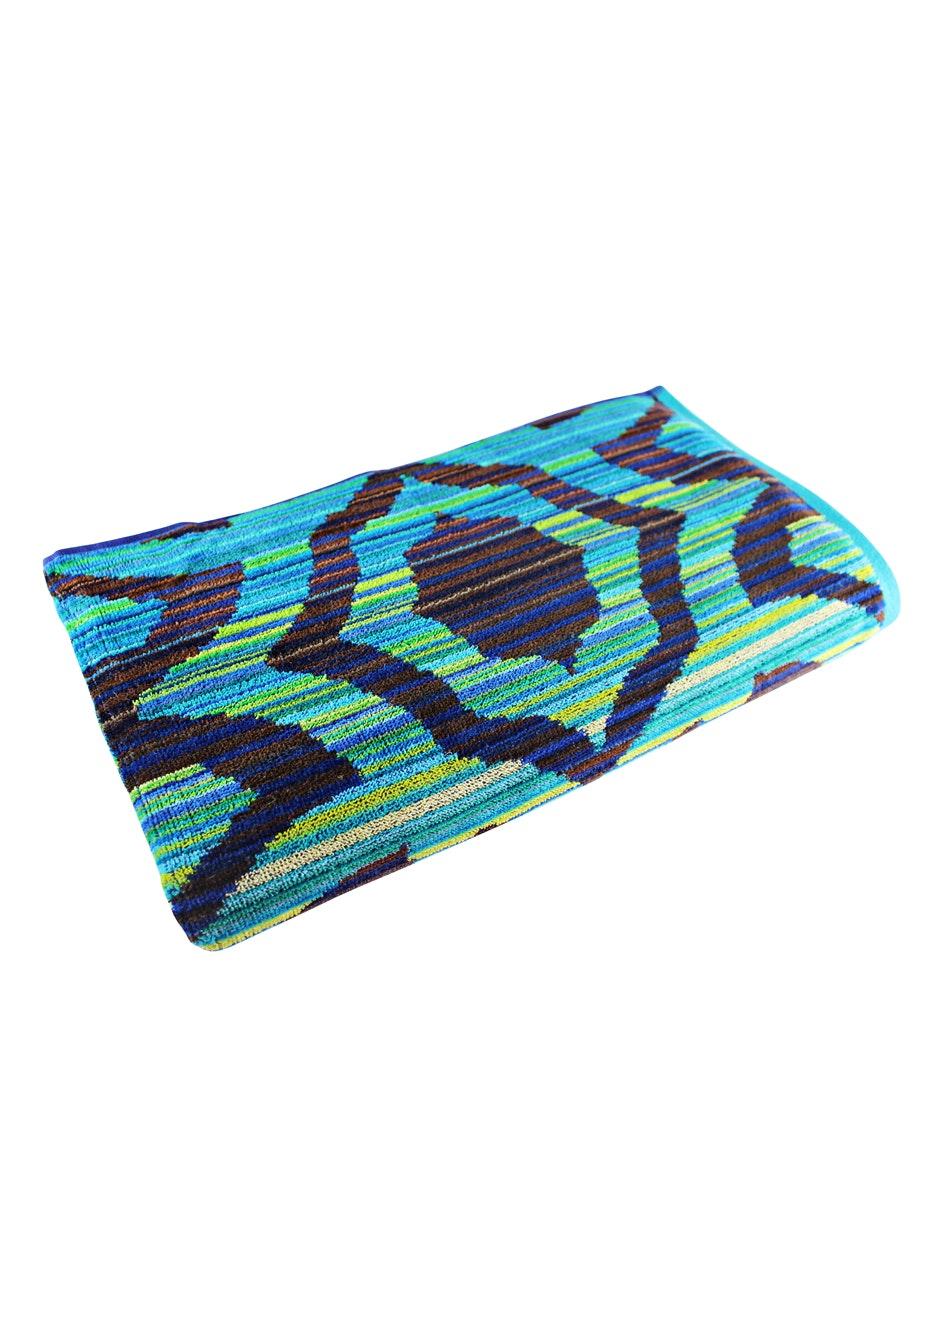 Ubud 100% Cotton Velour Jacquard Beach Towel - 100x180cm